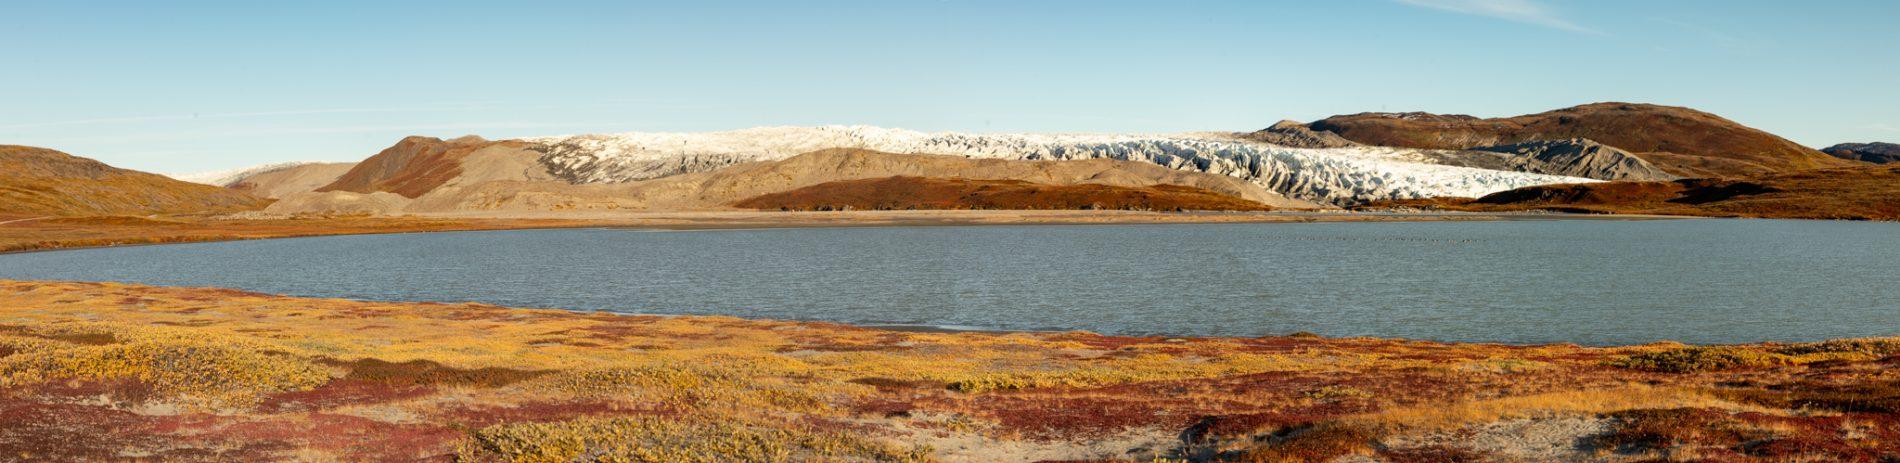 Photo: Panorama am See